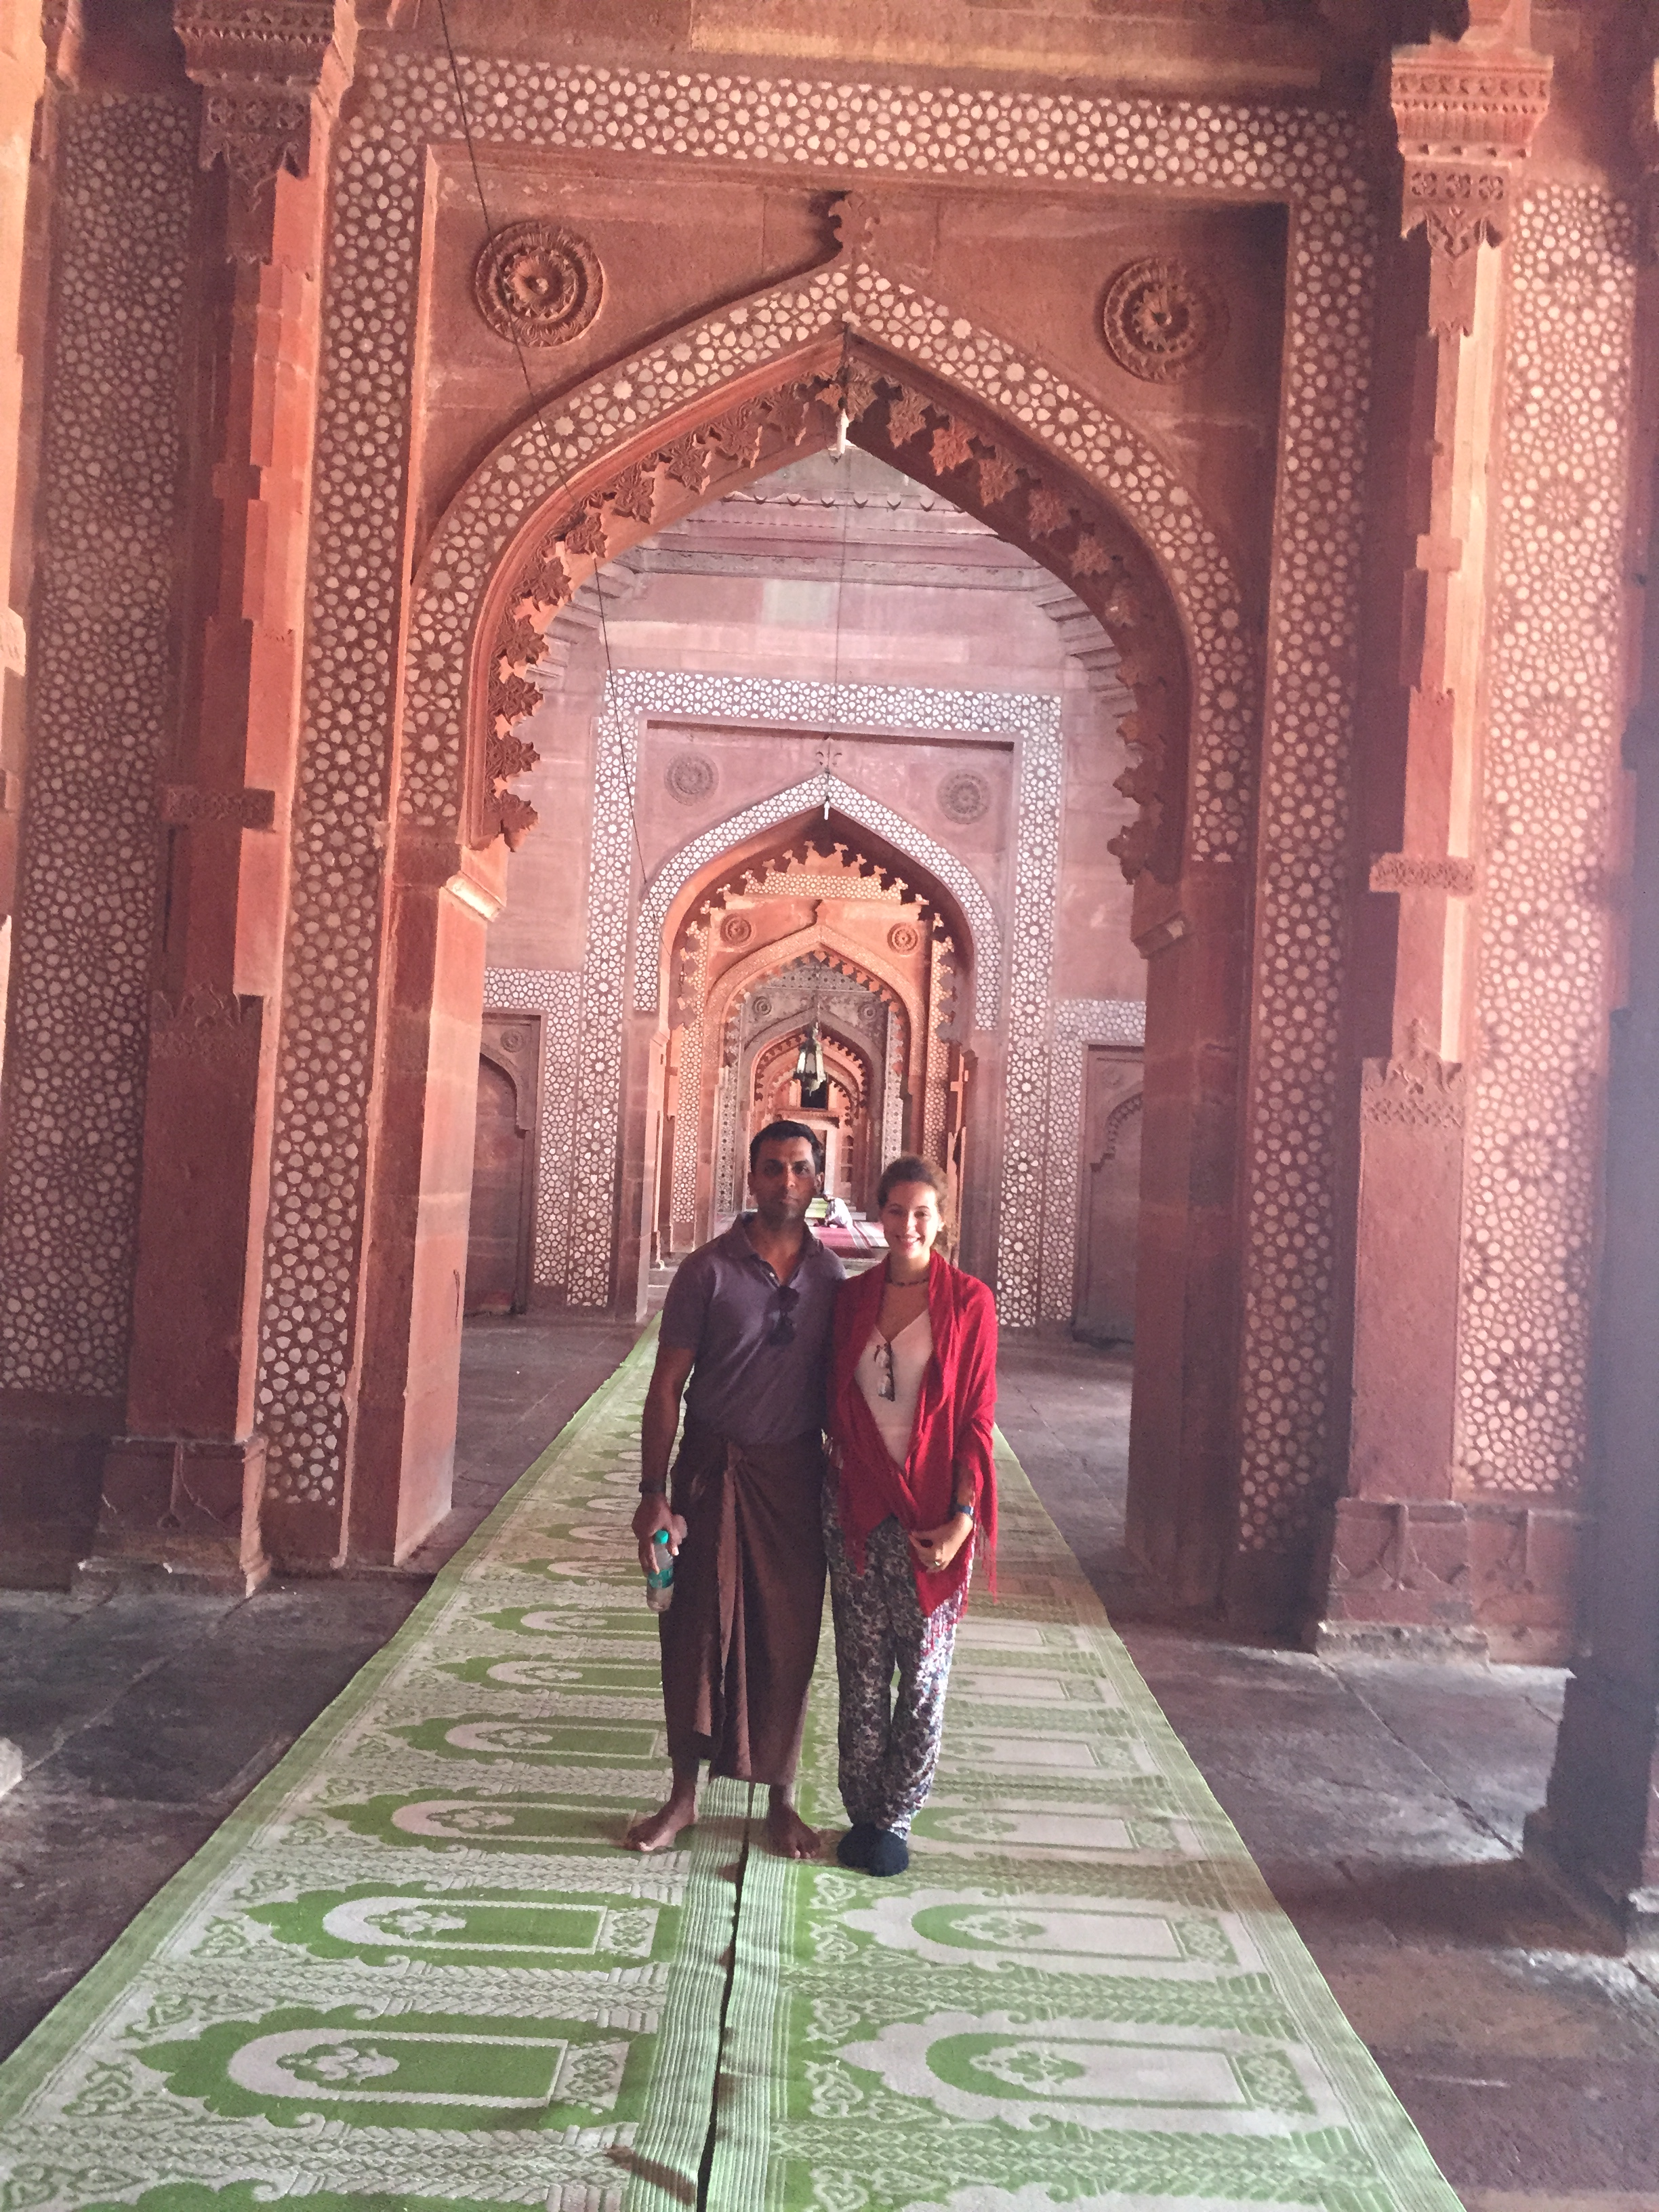 Inside Jami Masjid